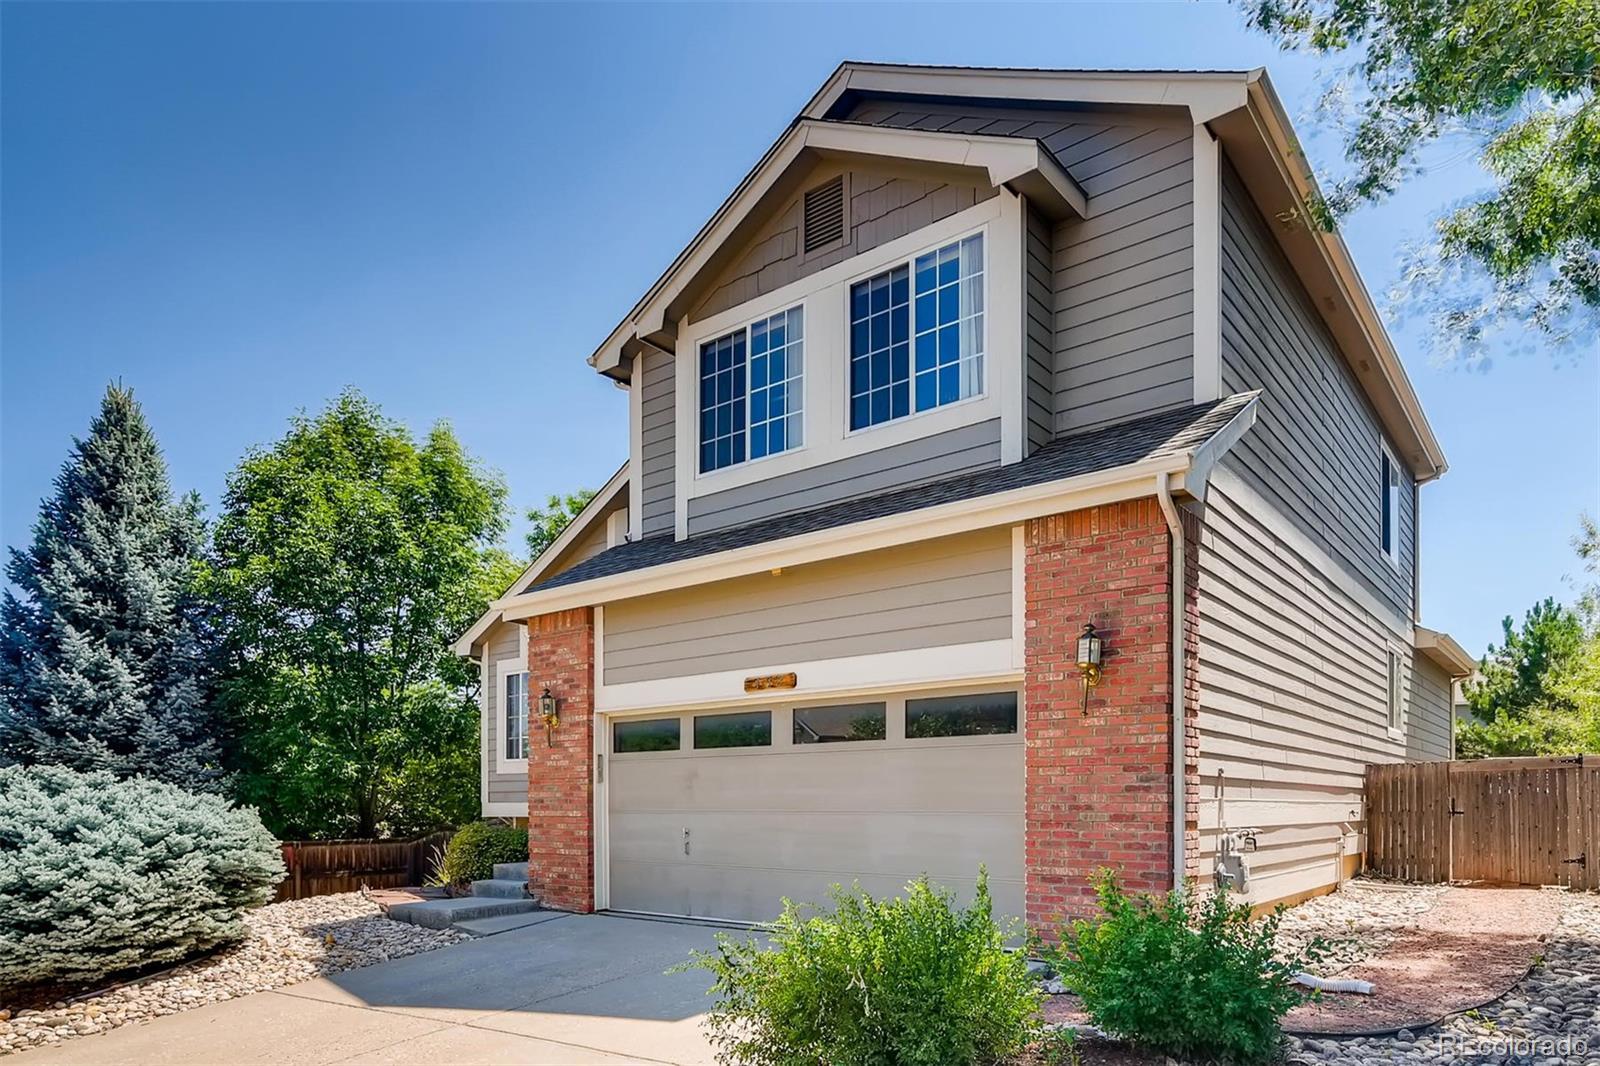 MLS# 9724731 - 4 - 498 Promontory Drive, Loveland, CO 80537